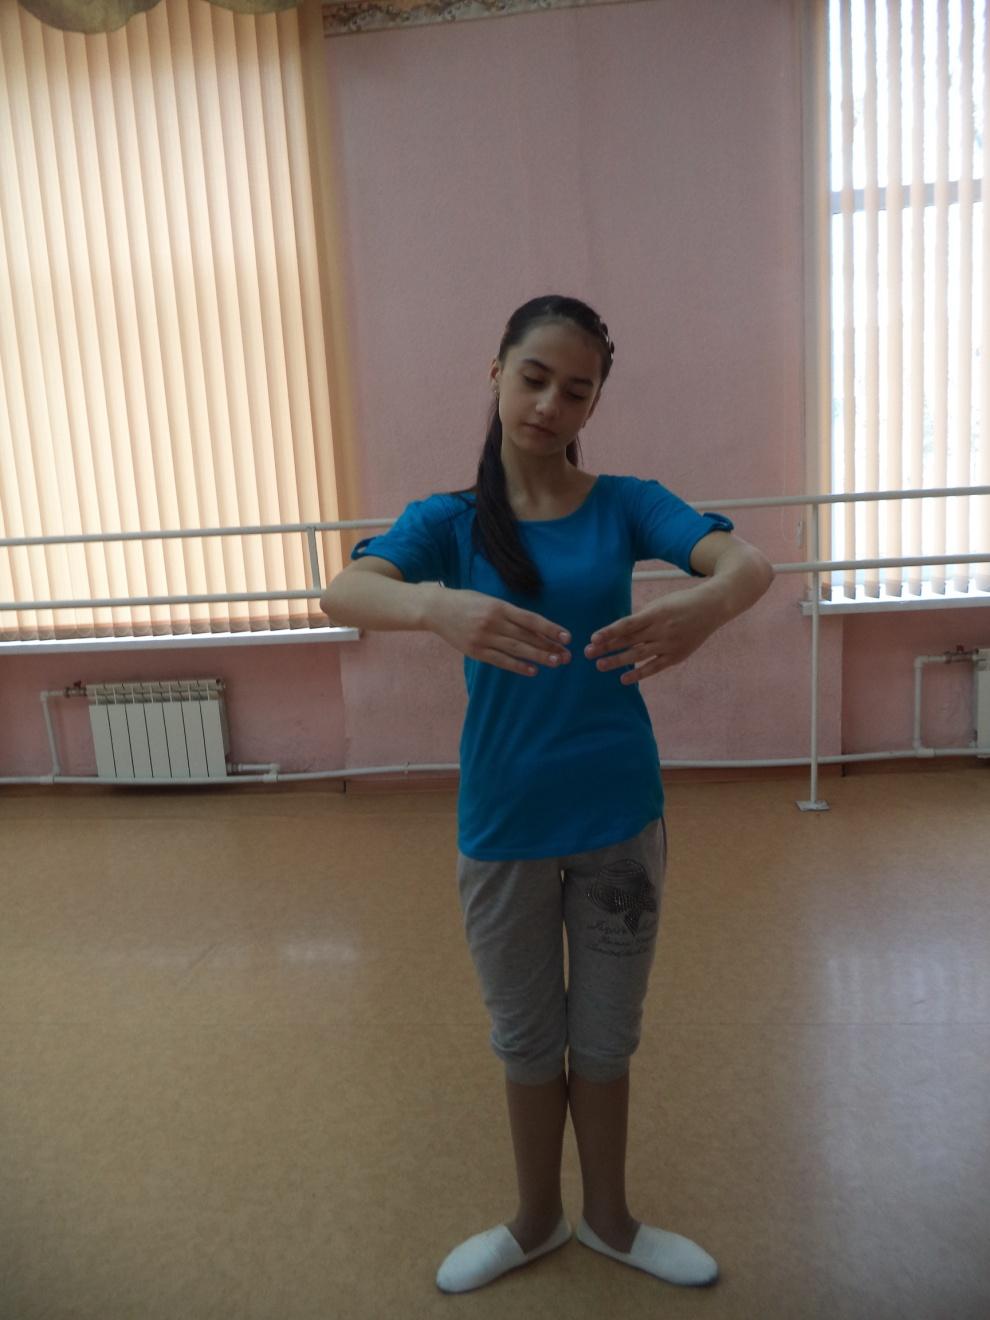 http://cl.rushkolnik.ru/tw_files2/urls_79/54/d-53948/53948_html_m20a62666.png